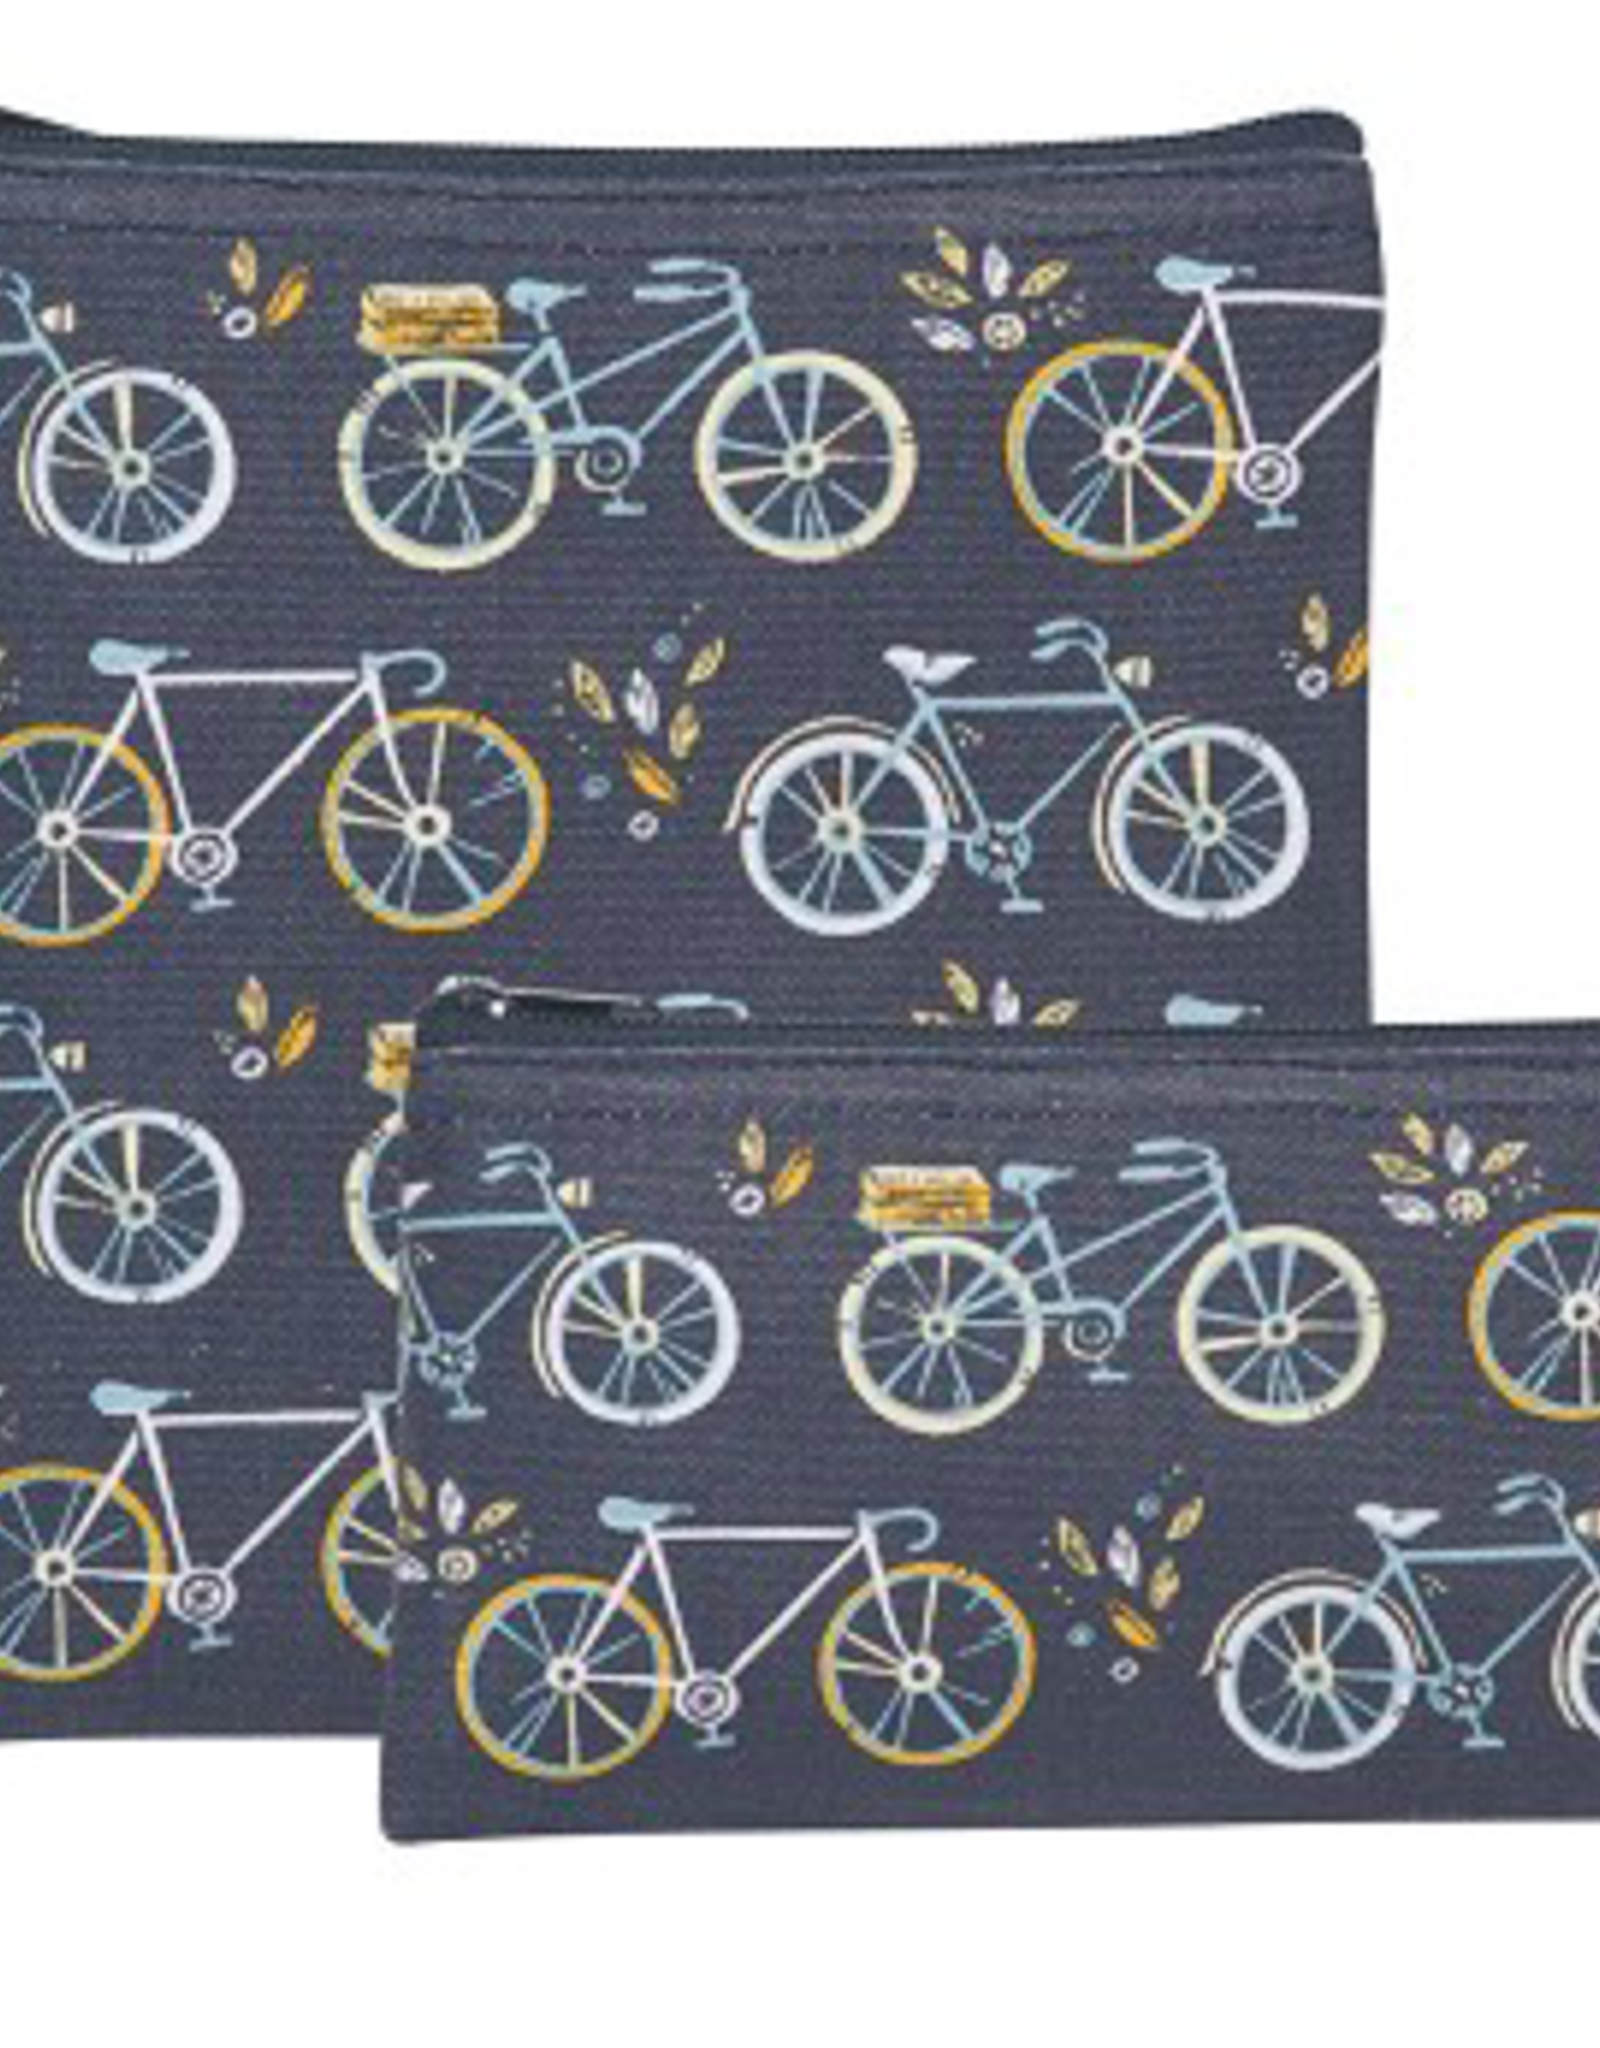 Sweet Ride Snack Bag Set 2